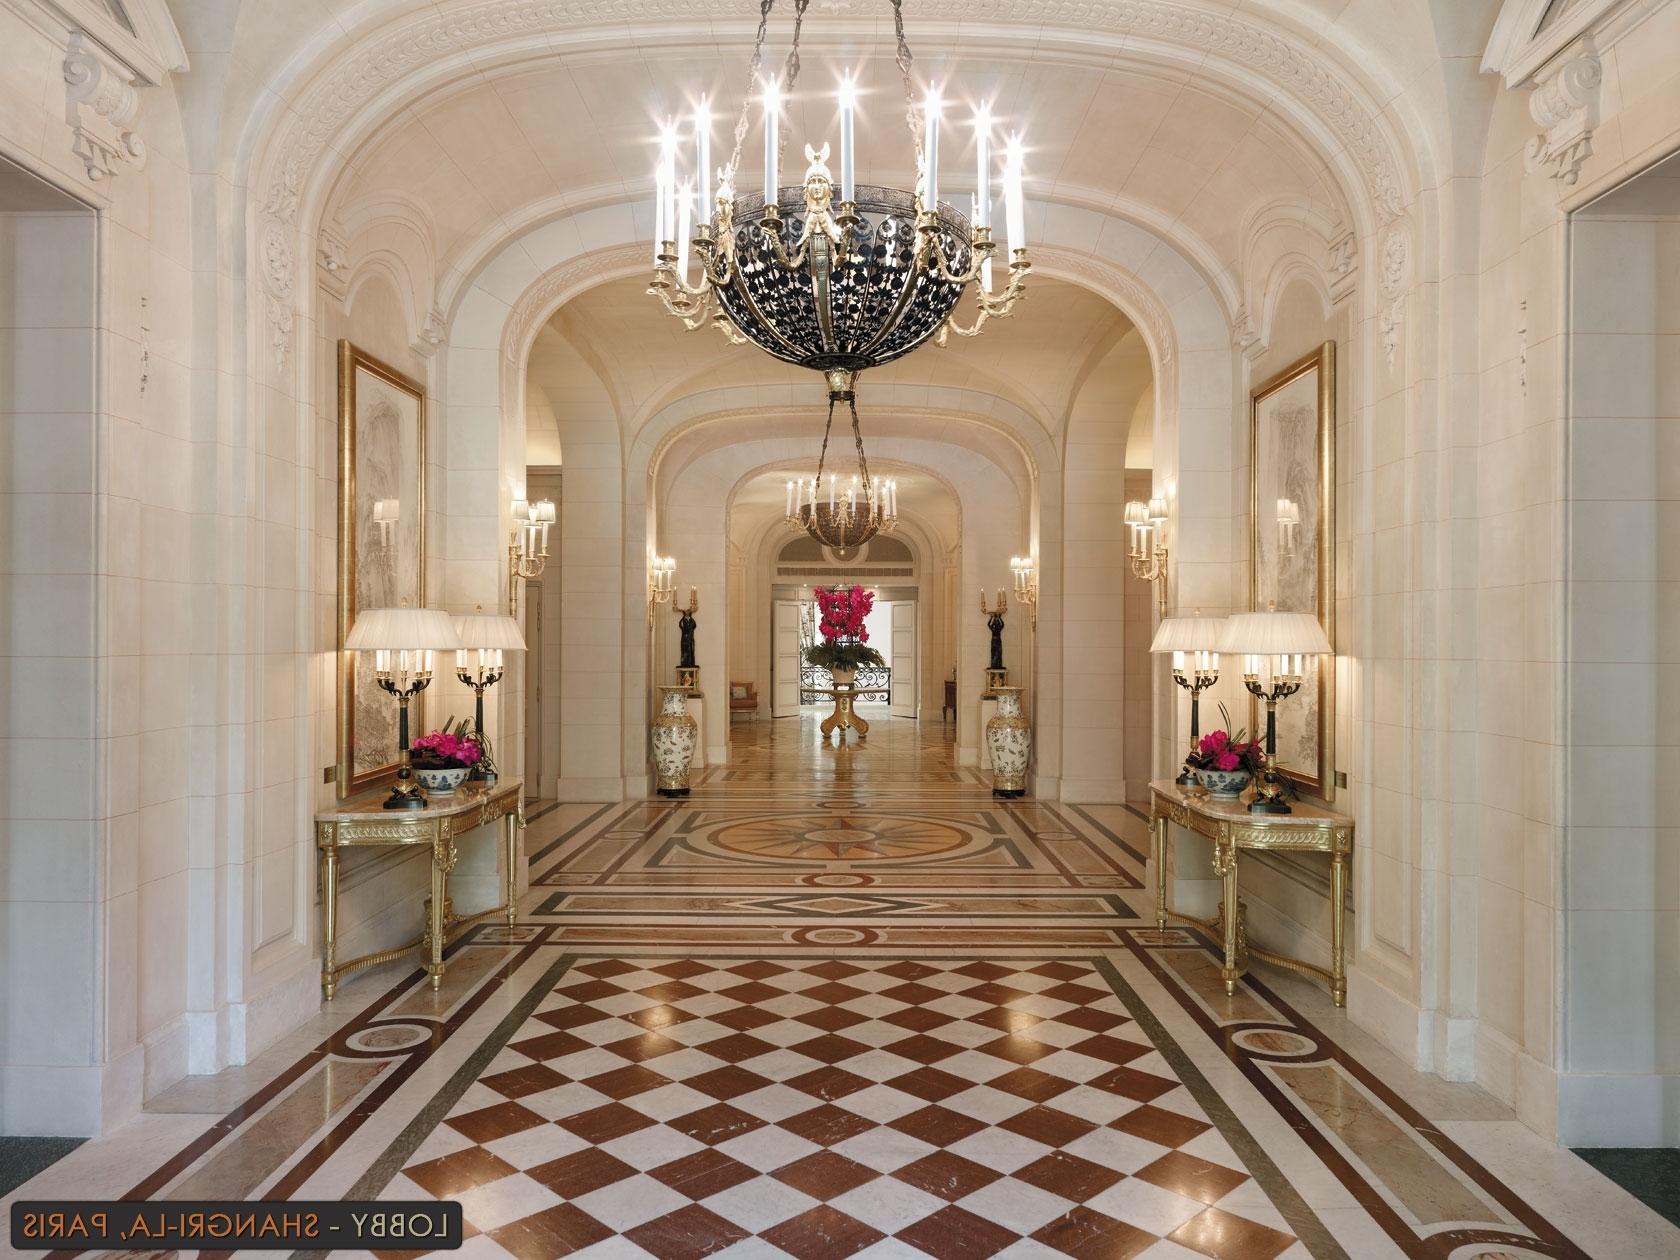 Preferred 5 Star Shangri La Hotel, Paris (View 15 of 20)